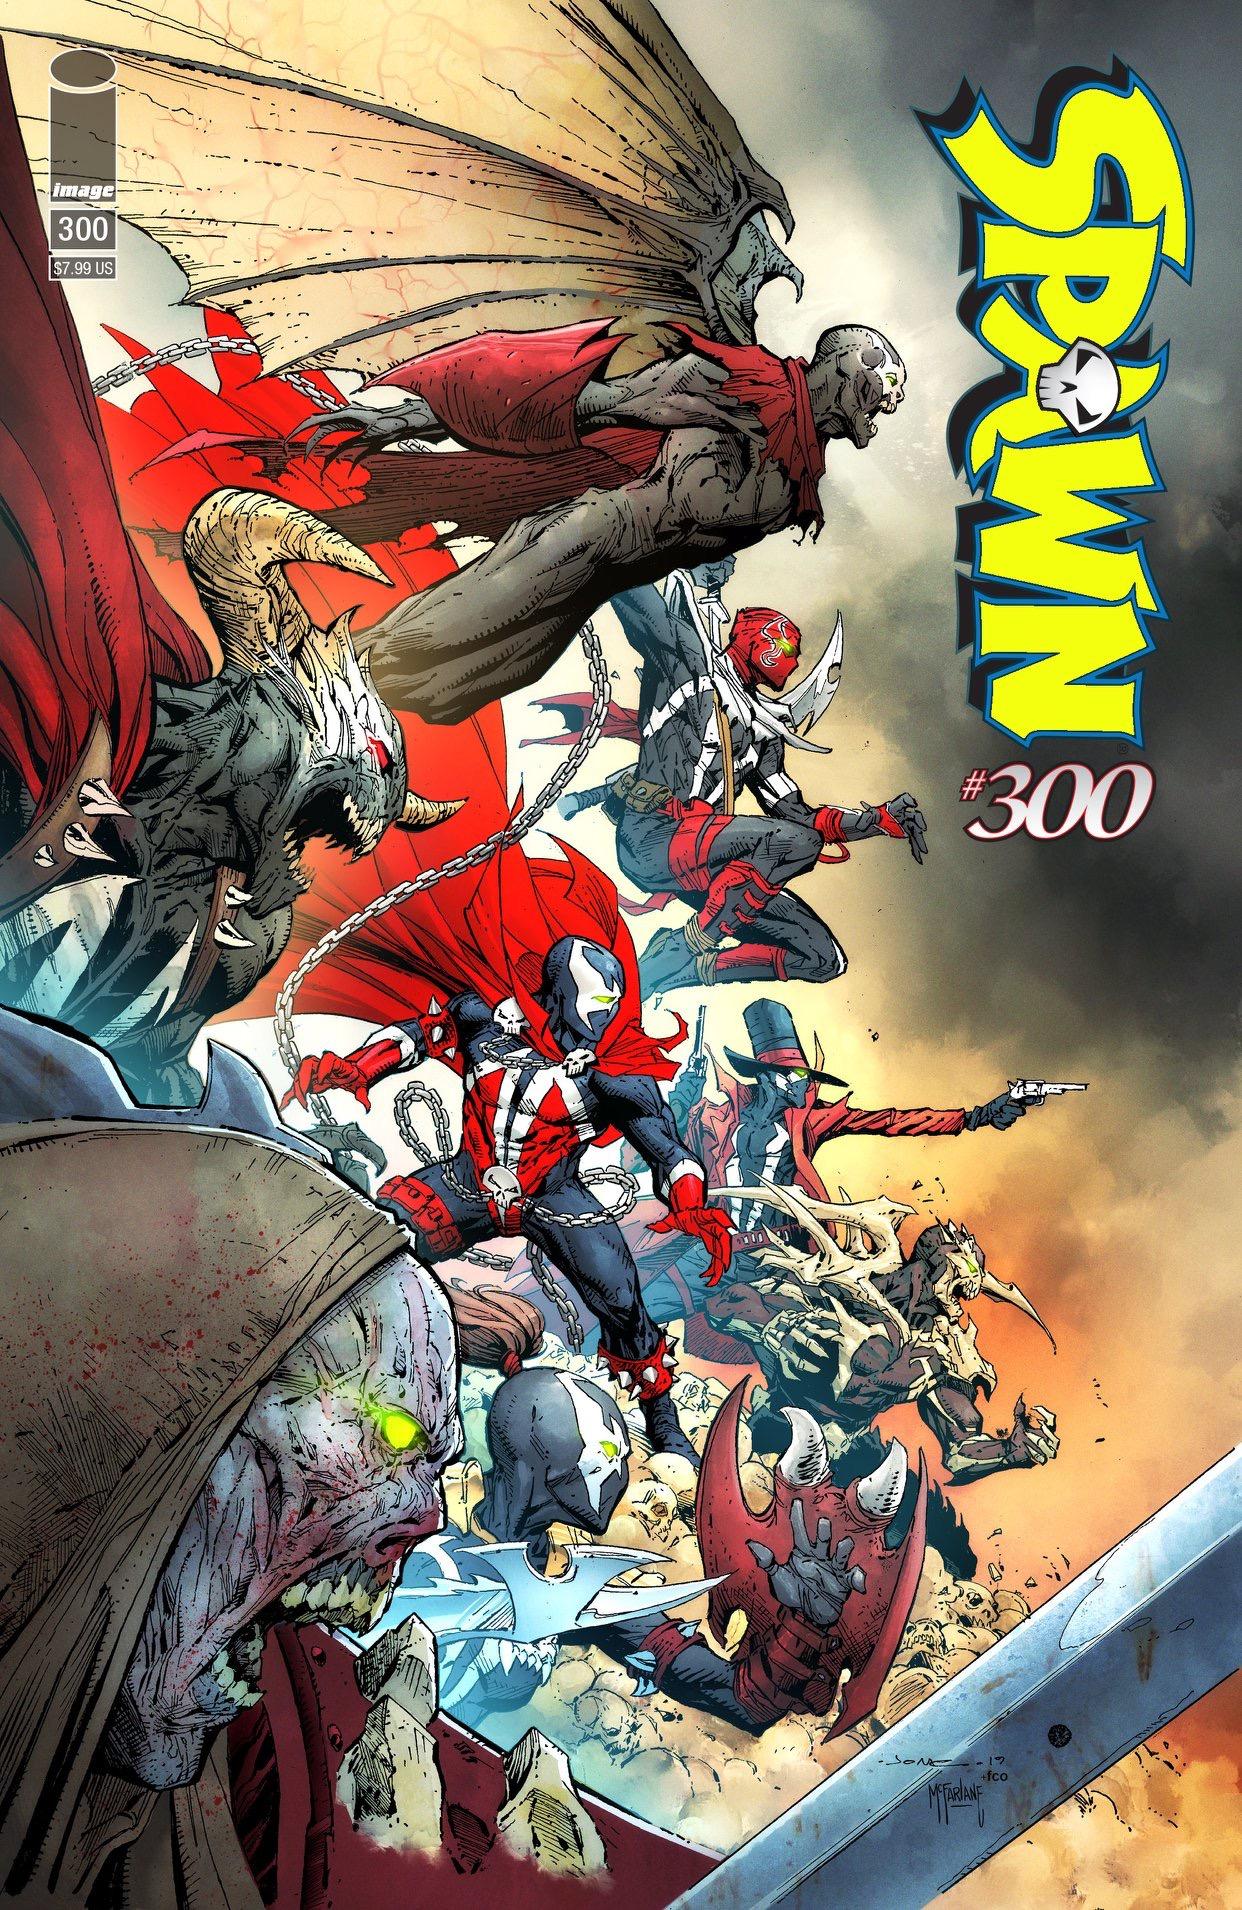 SPAWN 300 (VO) J. Scott Campbell Cover (G)